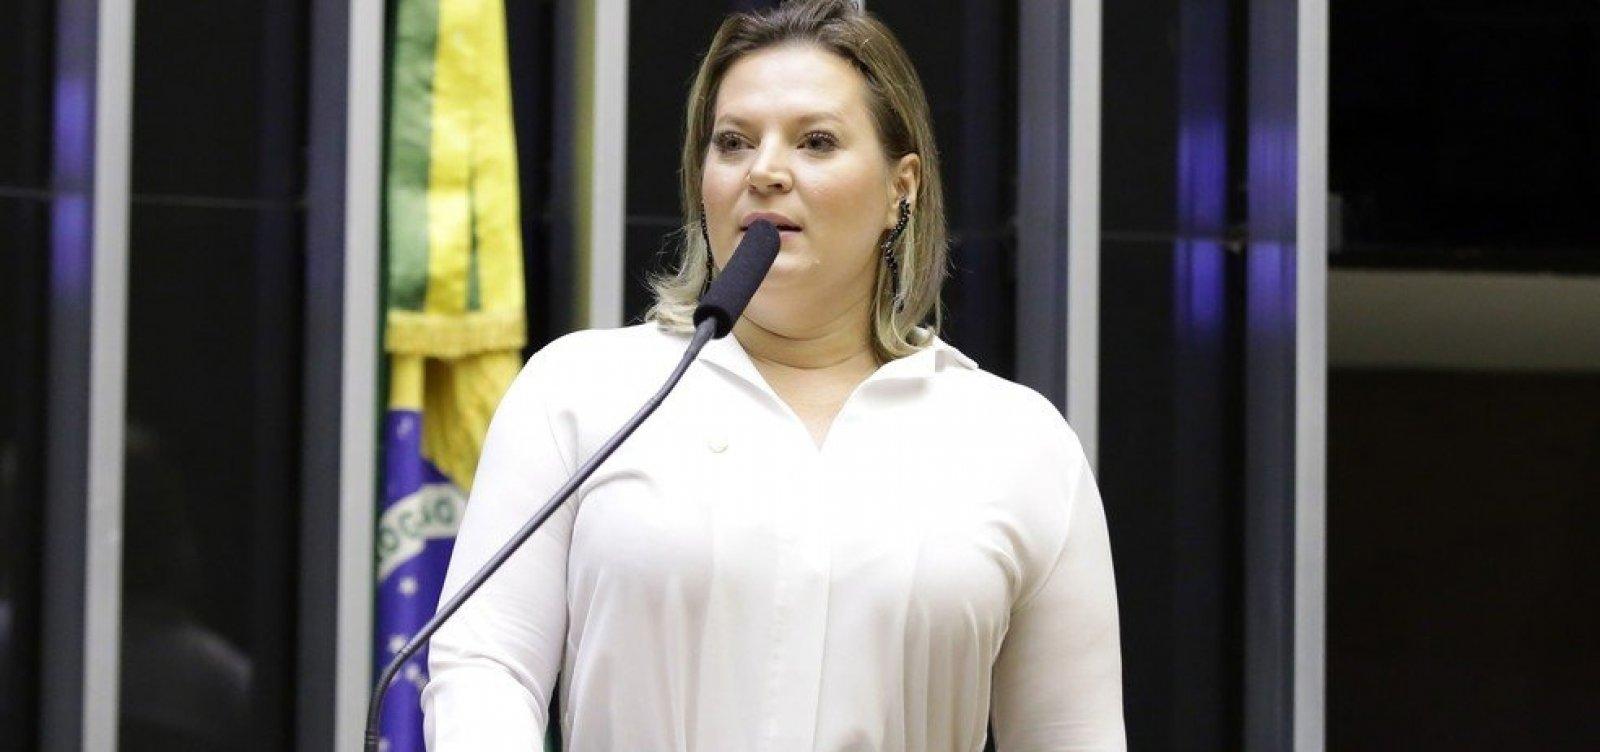 Após passar Carnaval em Ilhéus, Joice Hasselmann usou verba pública para voltar de viagem